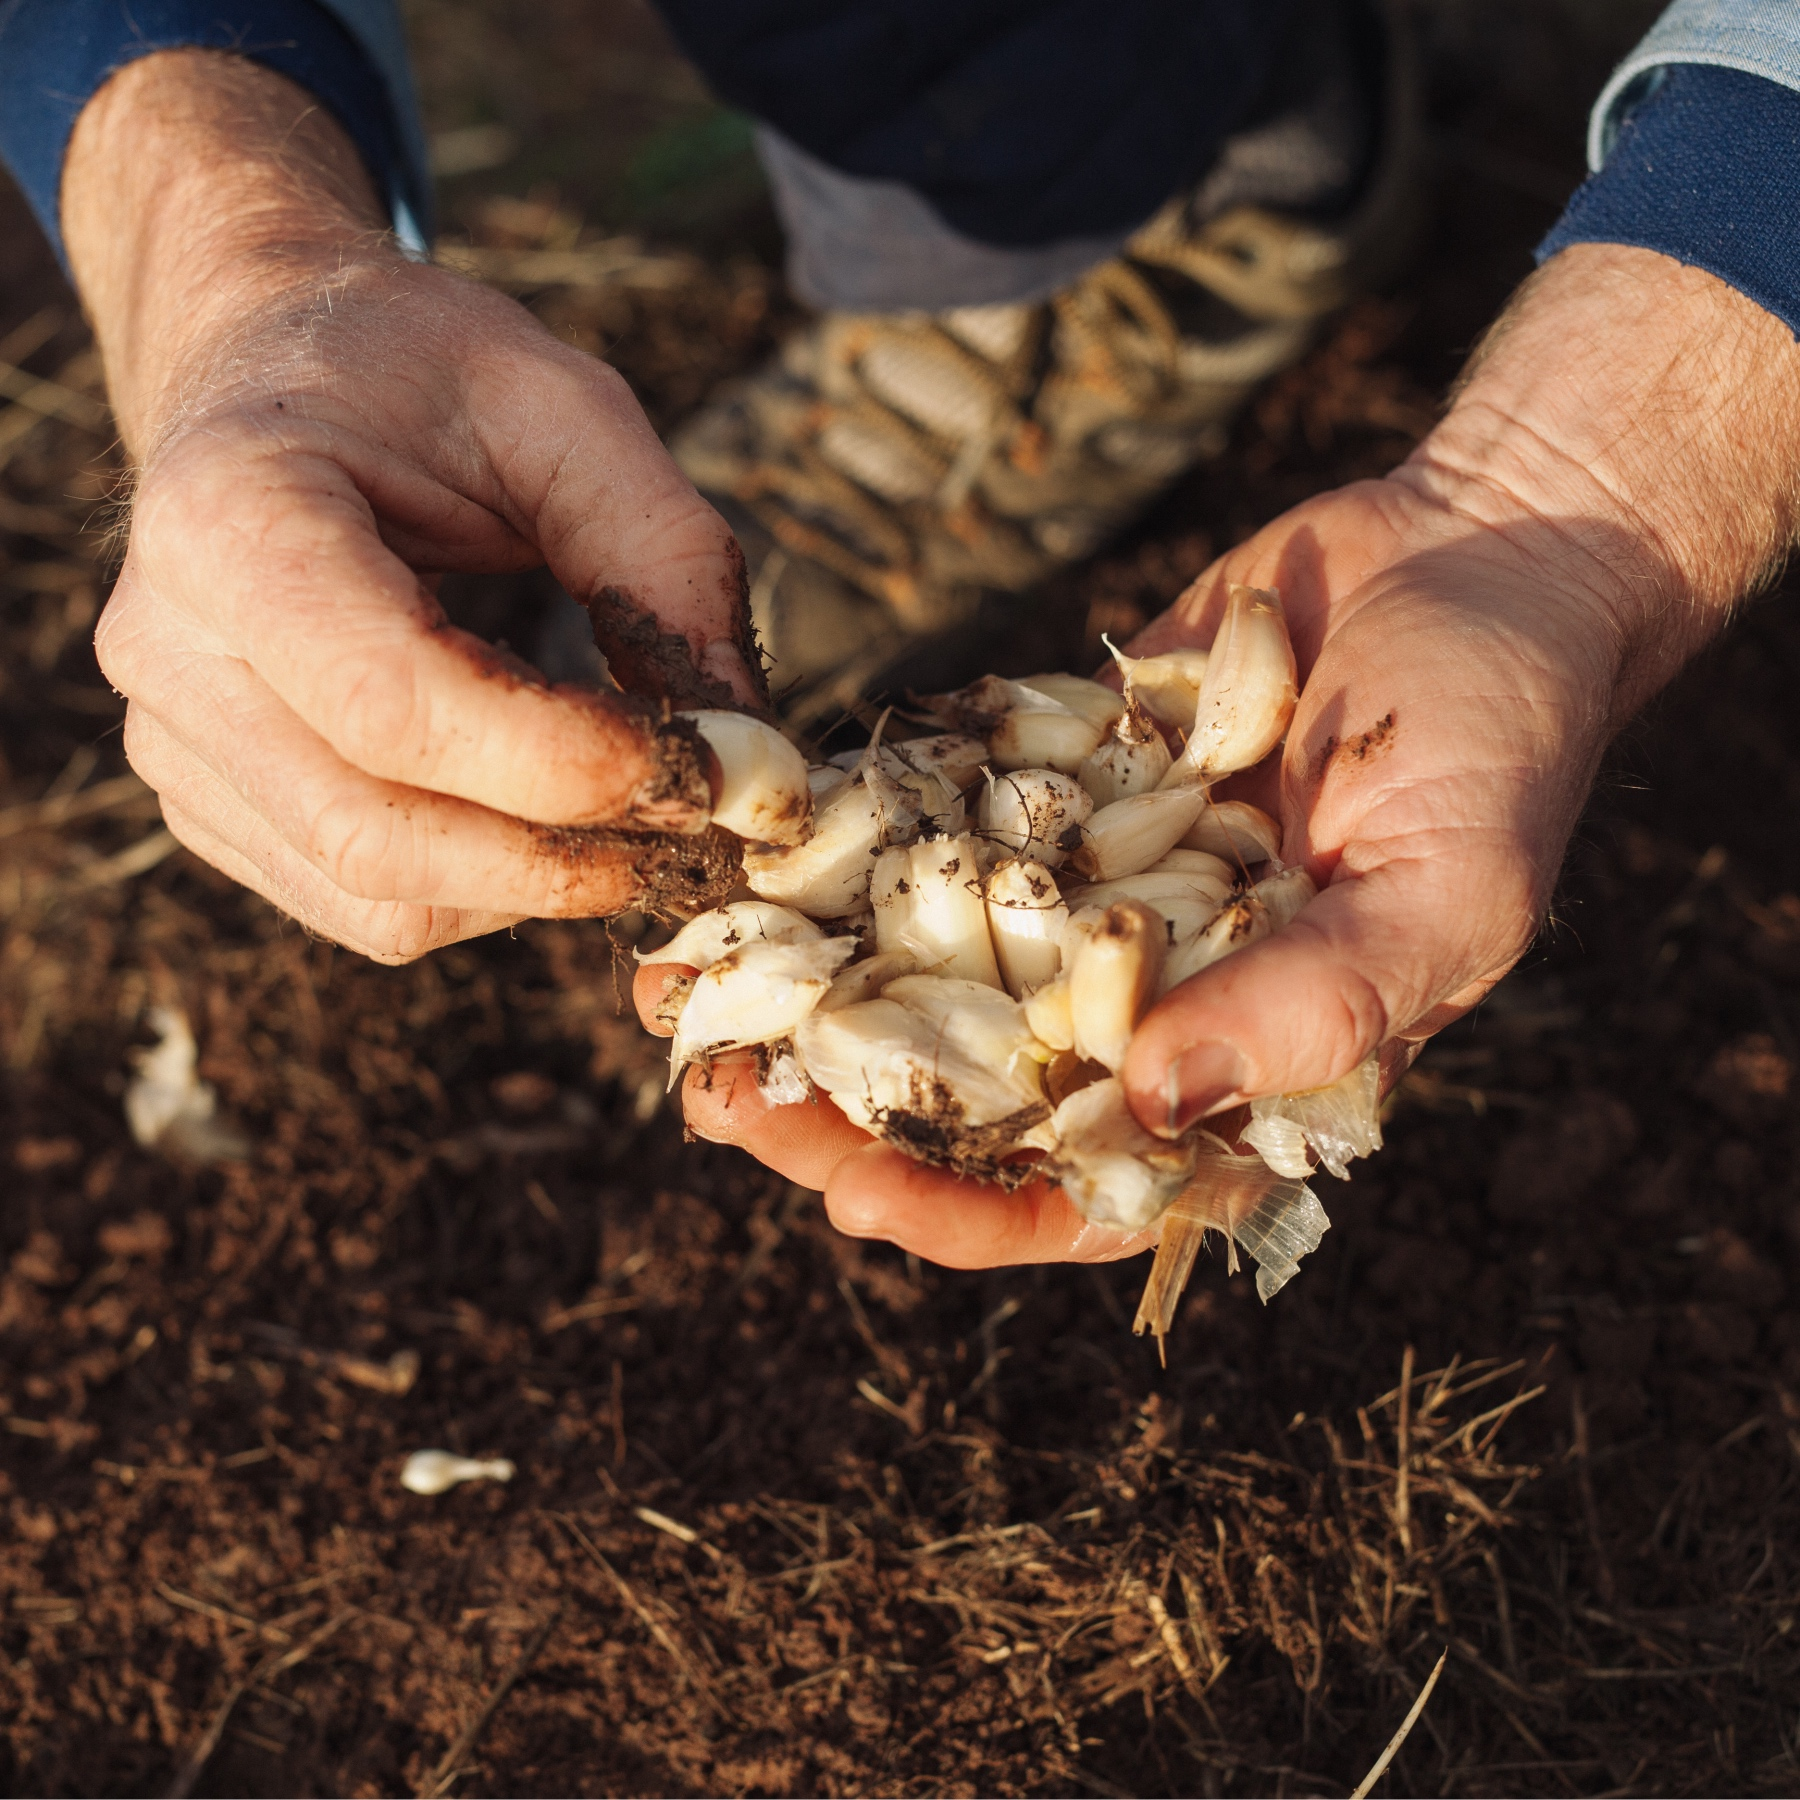 Katamatite Garlic is a family owned organic garlic farm in Katamatite, Victoria